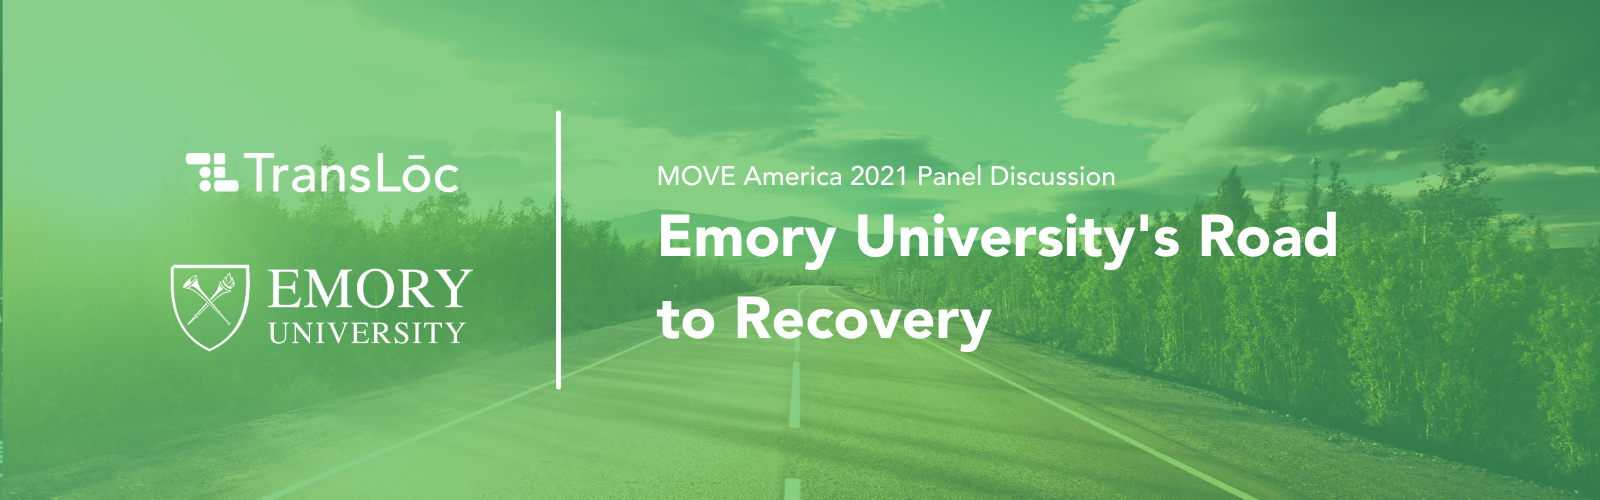 MOVE America_Emory University_Webinar